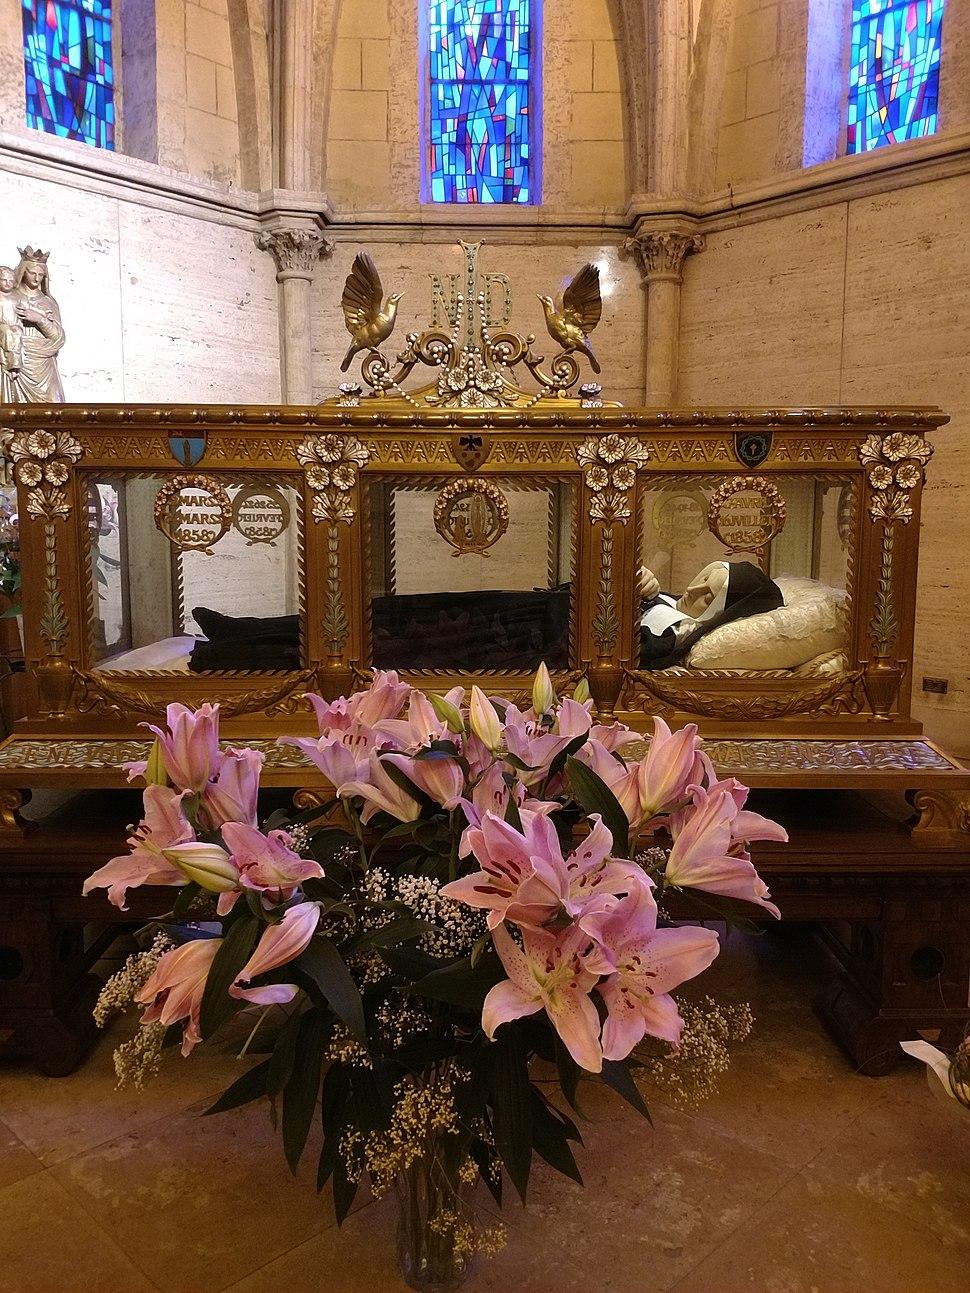 Saint Bernadette's incorrupt body